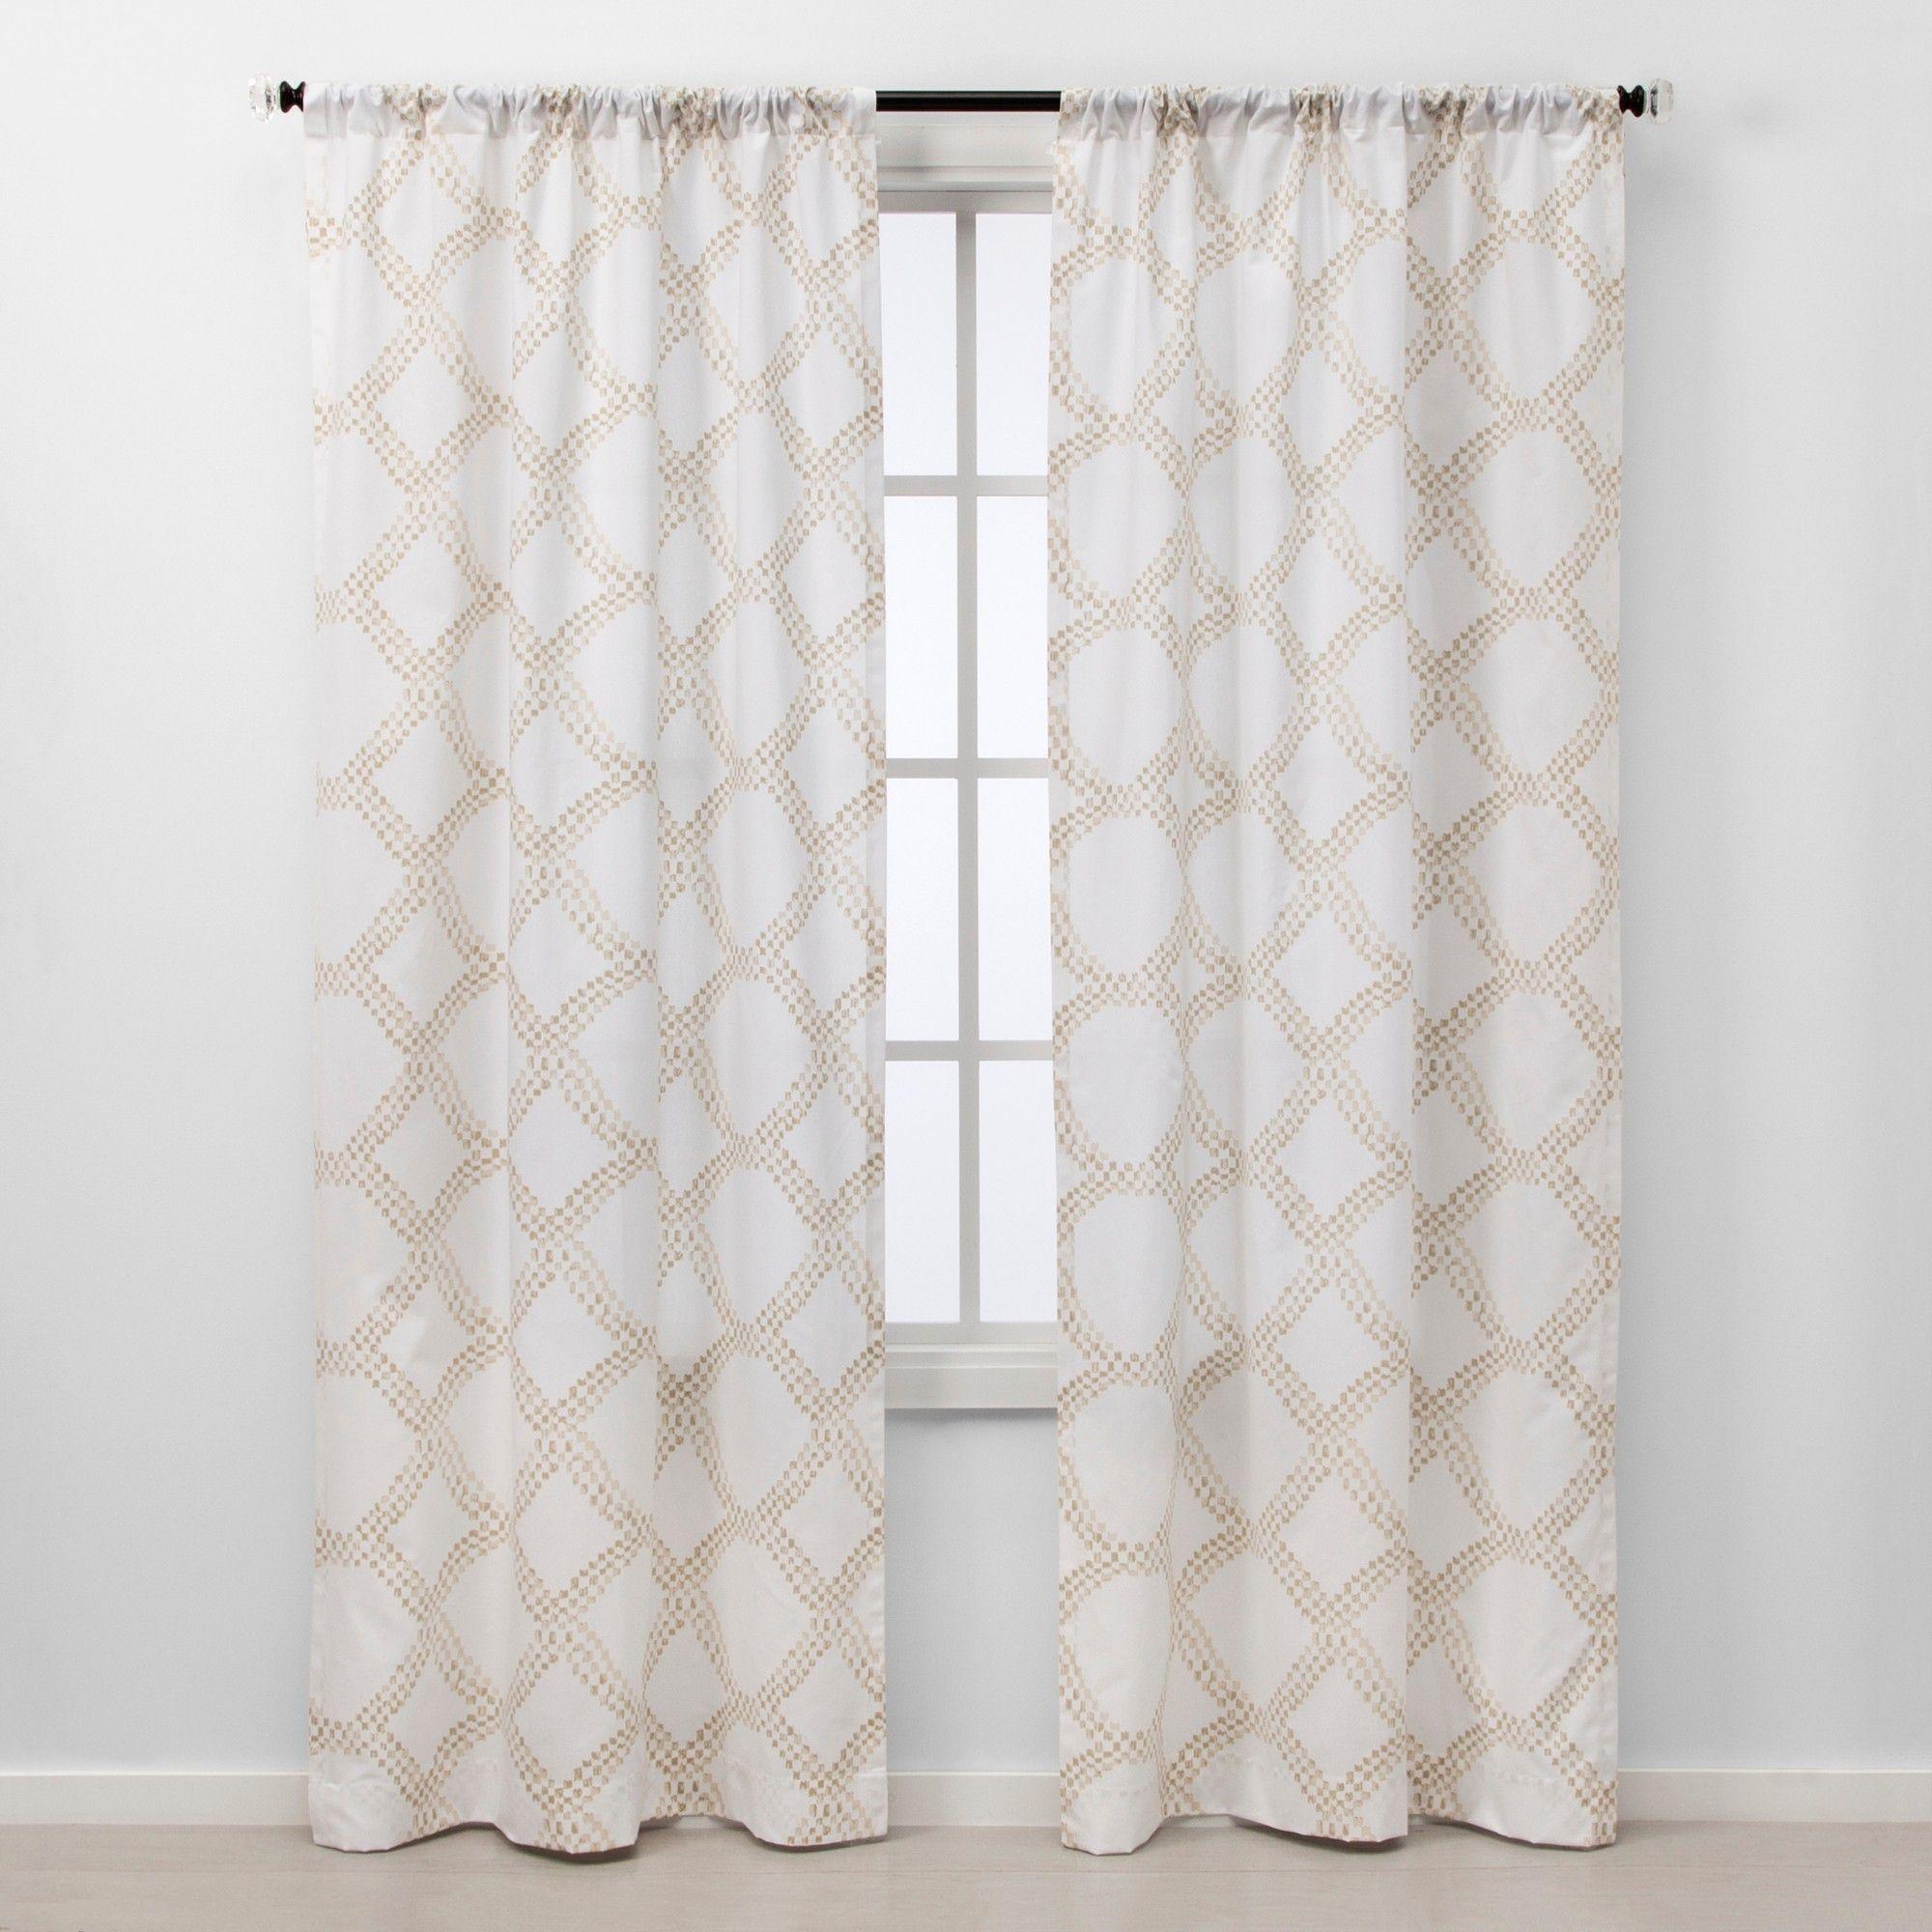 84 X40 Light Filtering Geometric Window Curtain Panel White